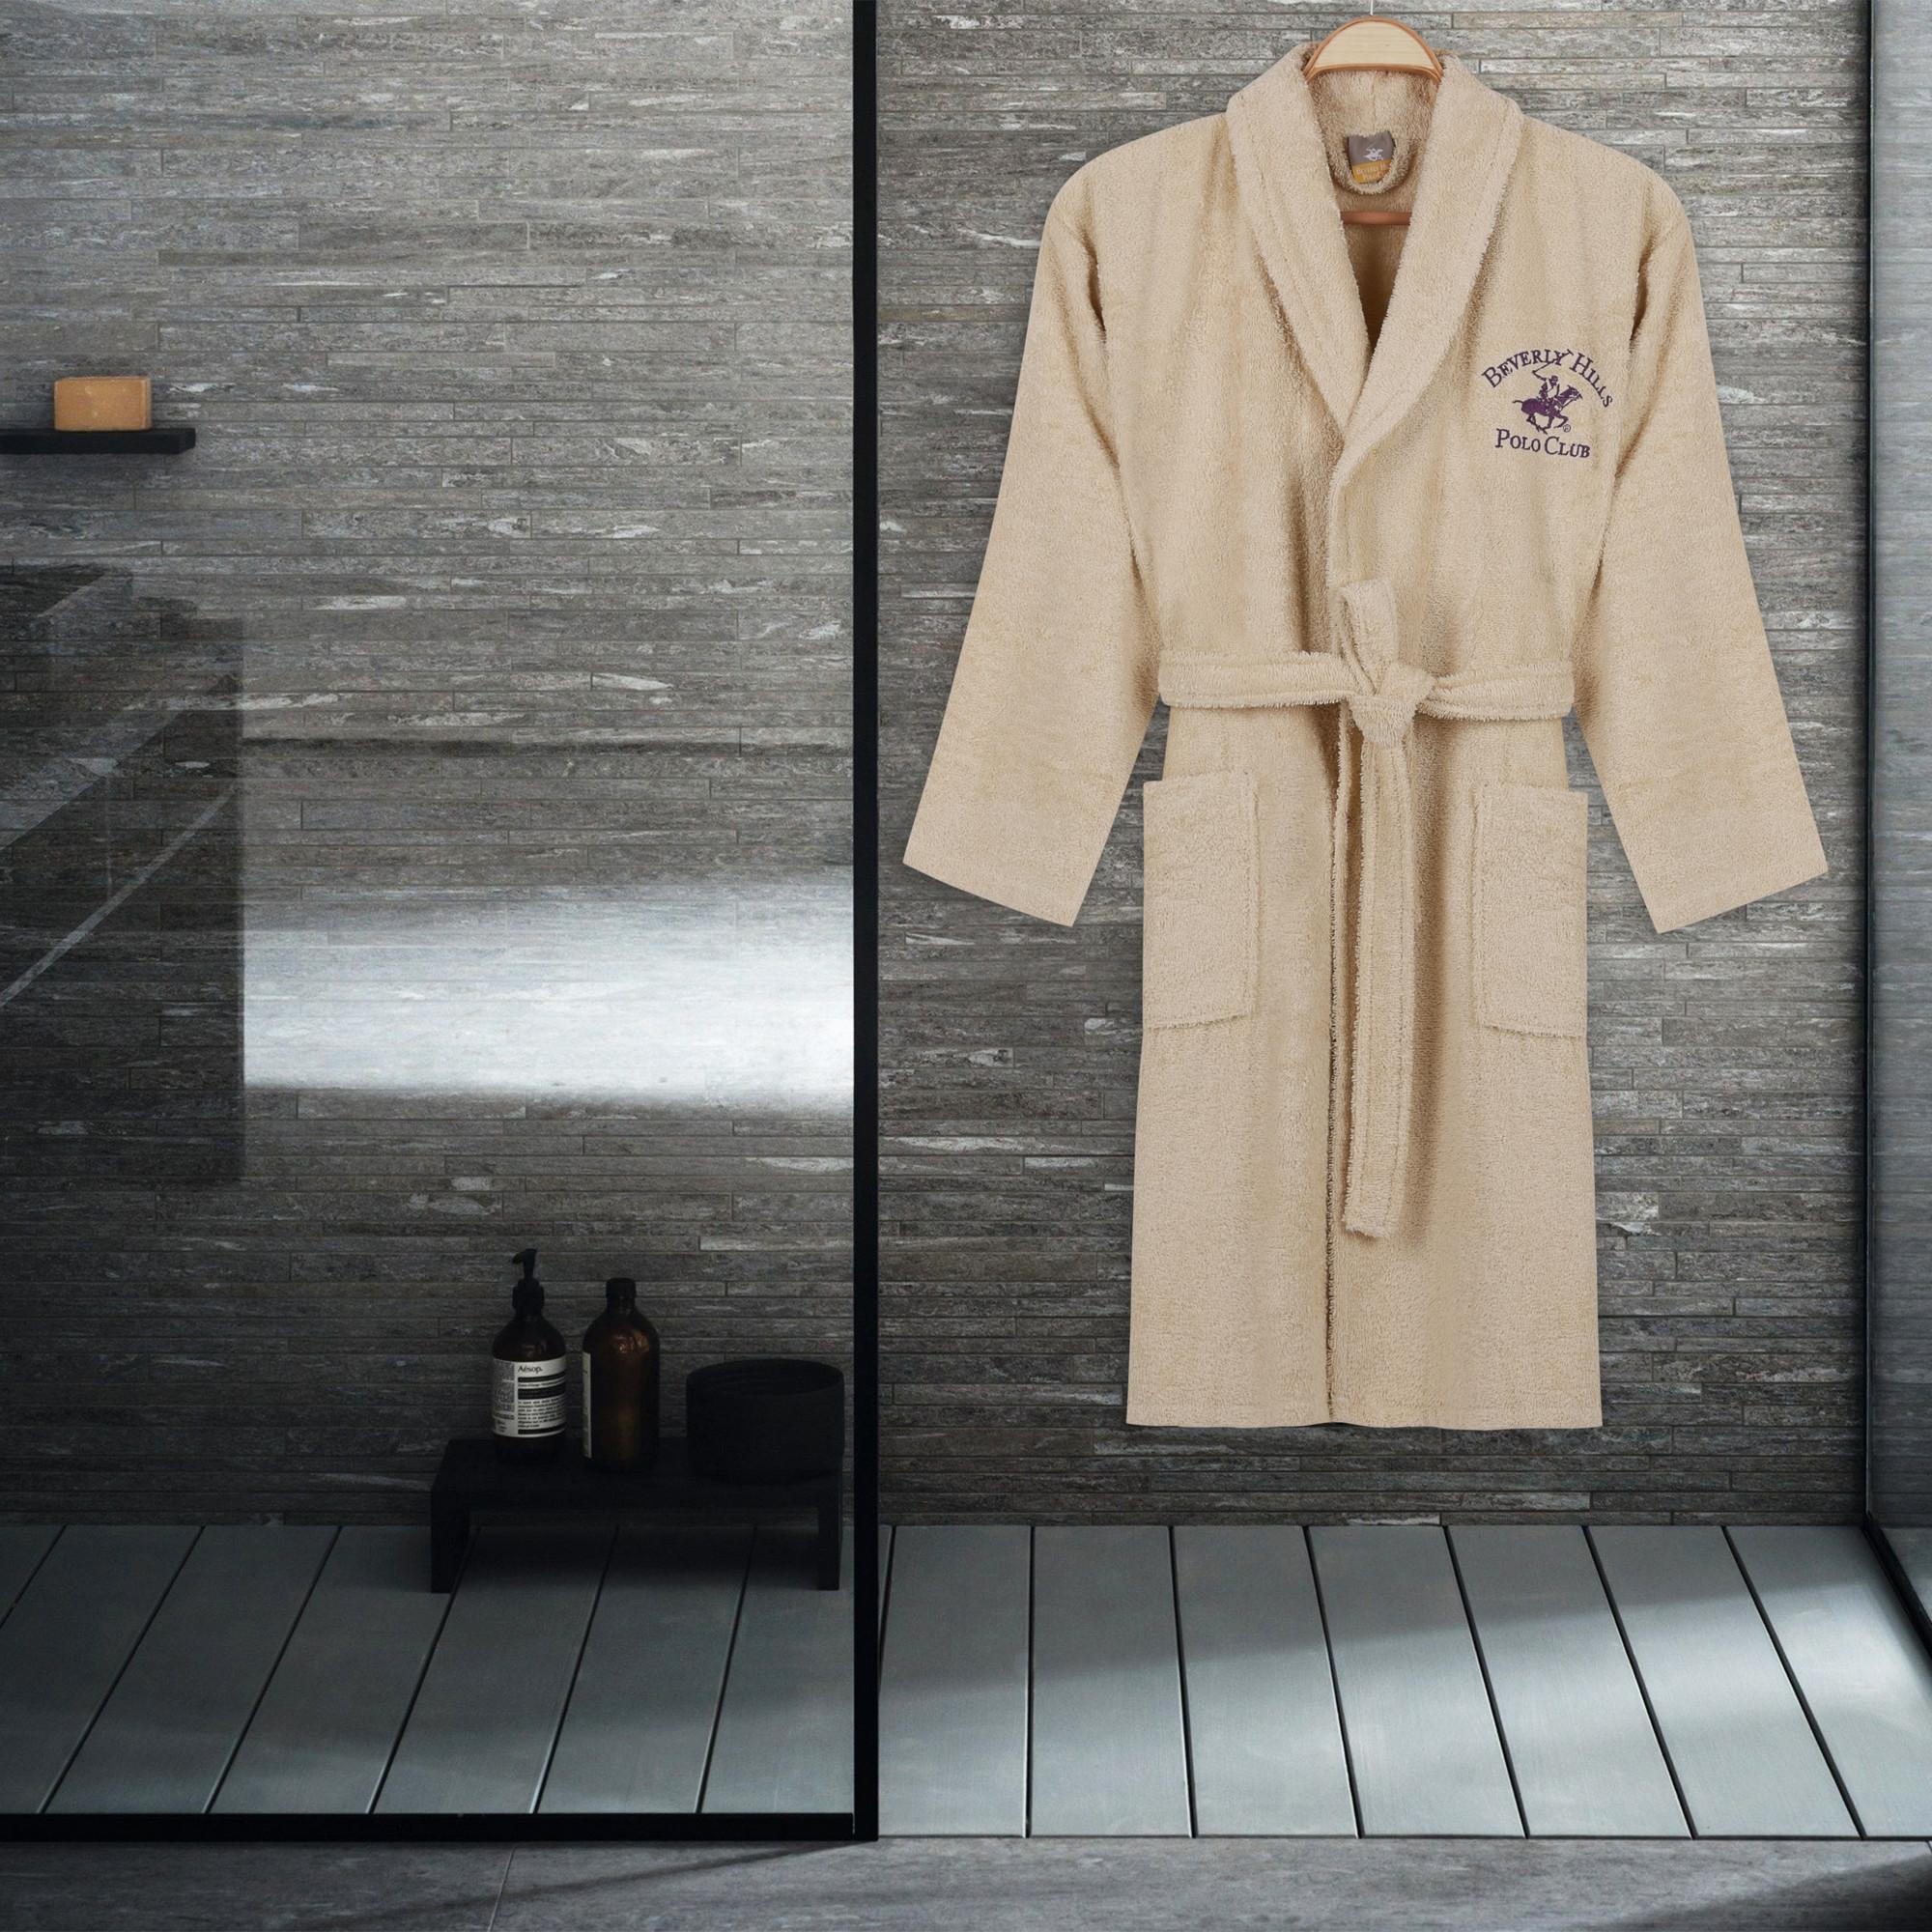 Halat de baie unisex, din bumbac, Beverly Hills Polo Club 700 Crem, M / L poza